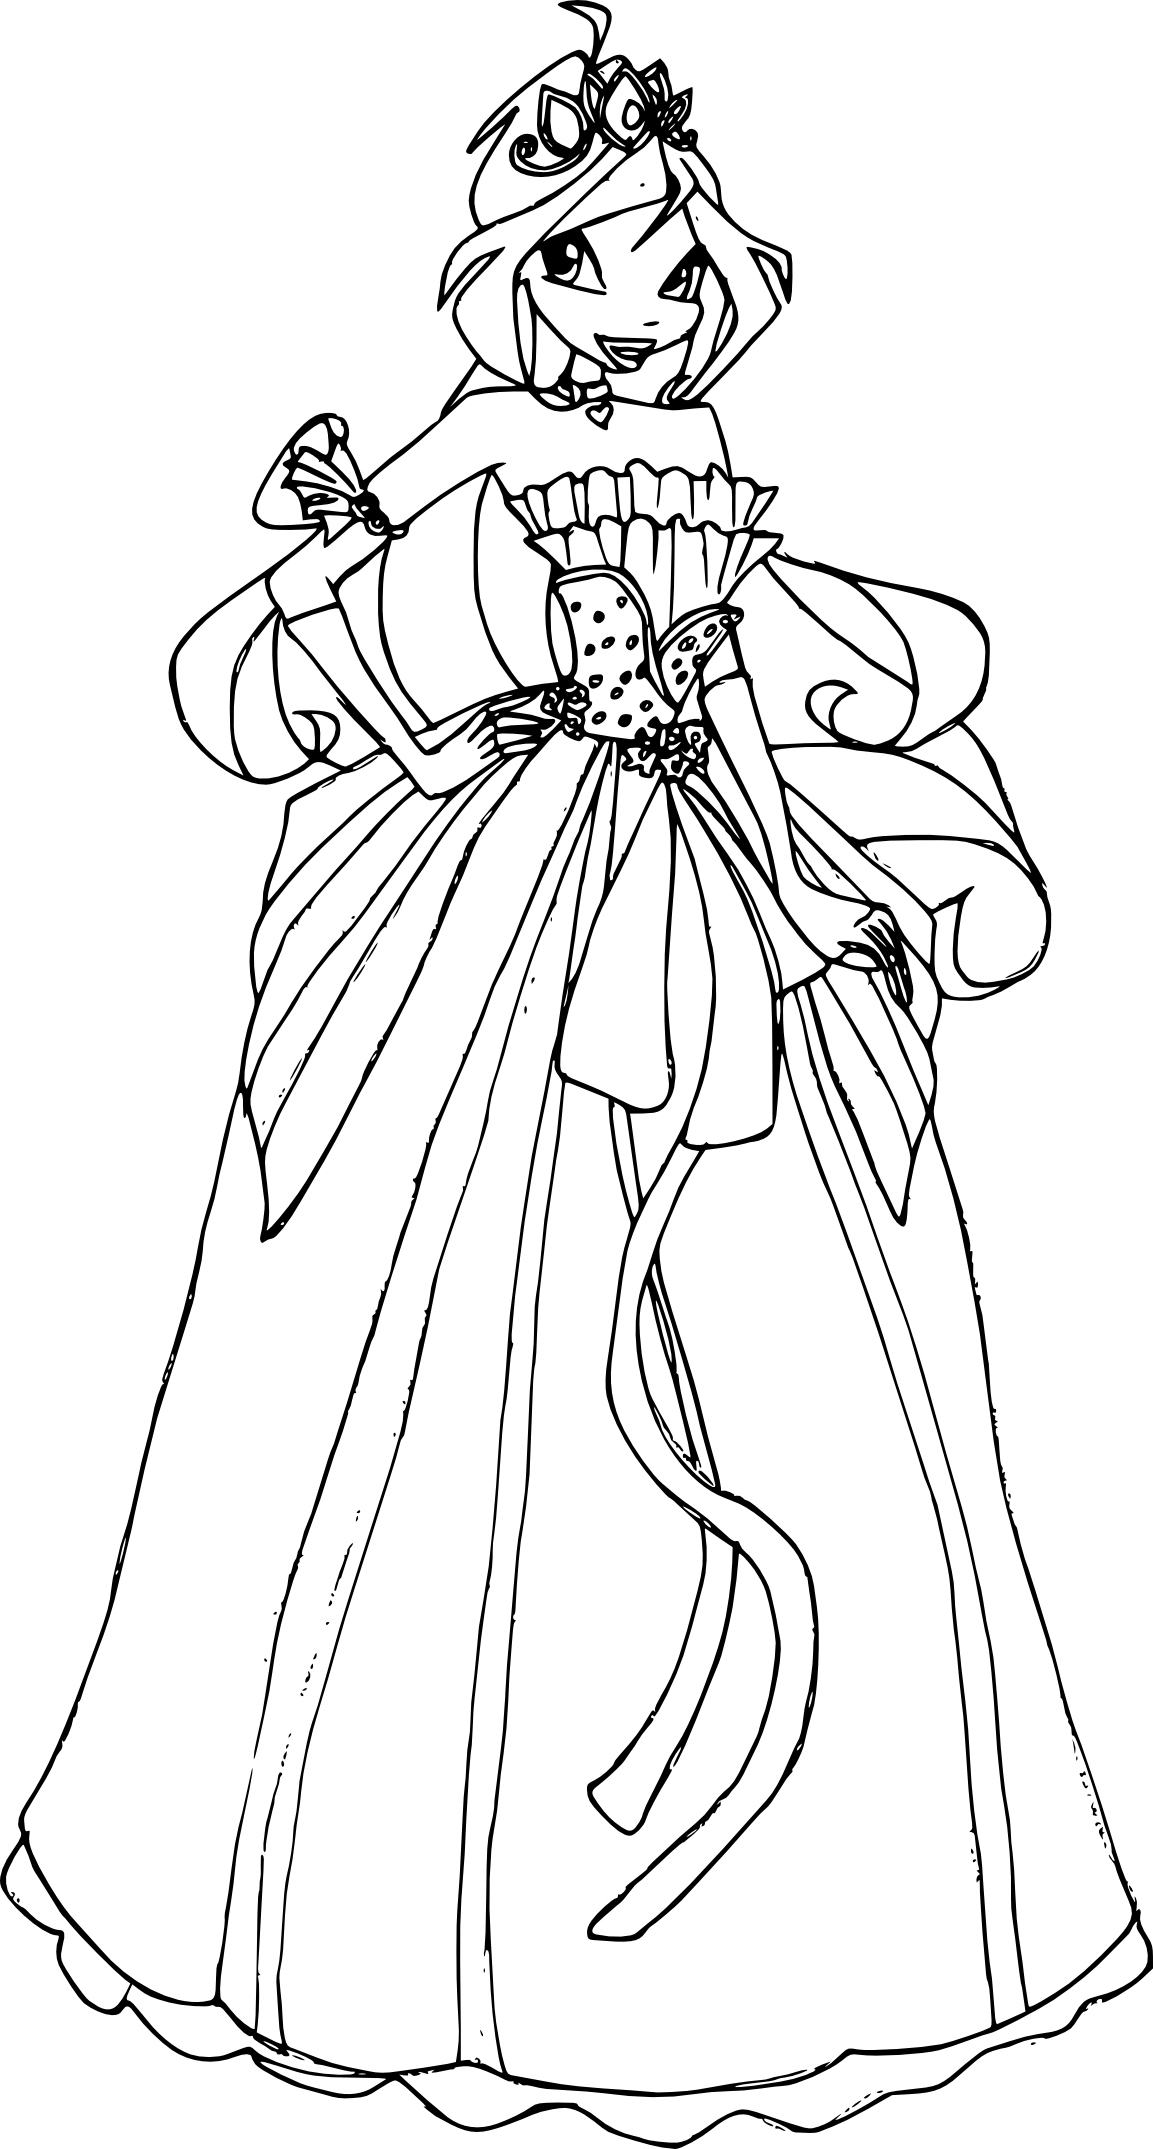 Coloriage Bloom Princesse Winx À Imprimer tout Coloriage De Princesse À Imprimer Gratuit